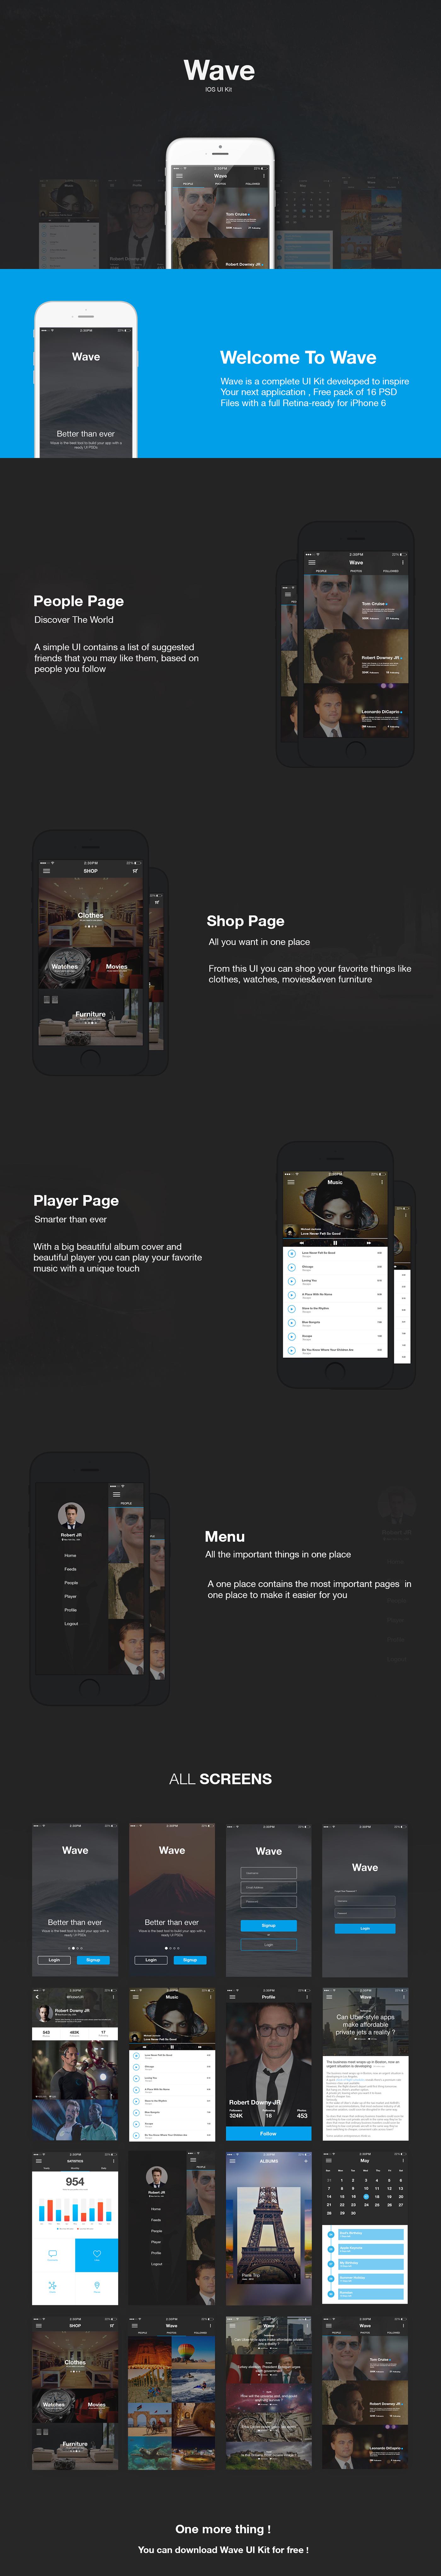 wave UI ux Web free psd menu kit download profile people ios mobile vector